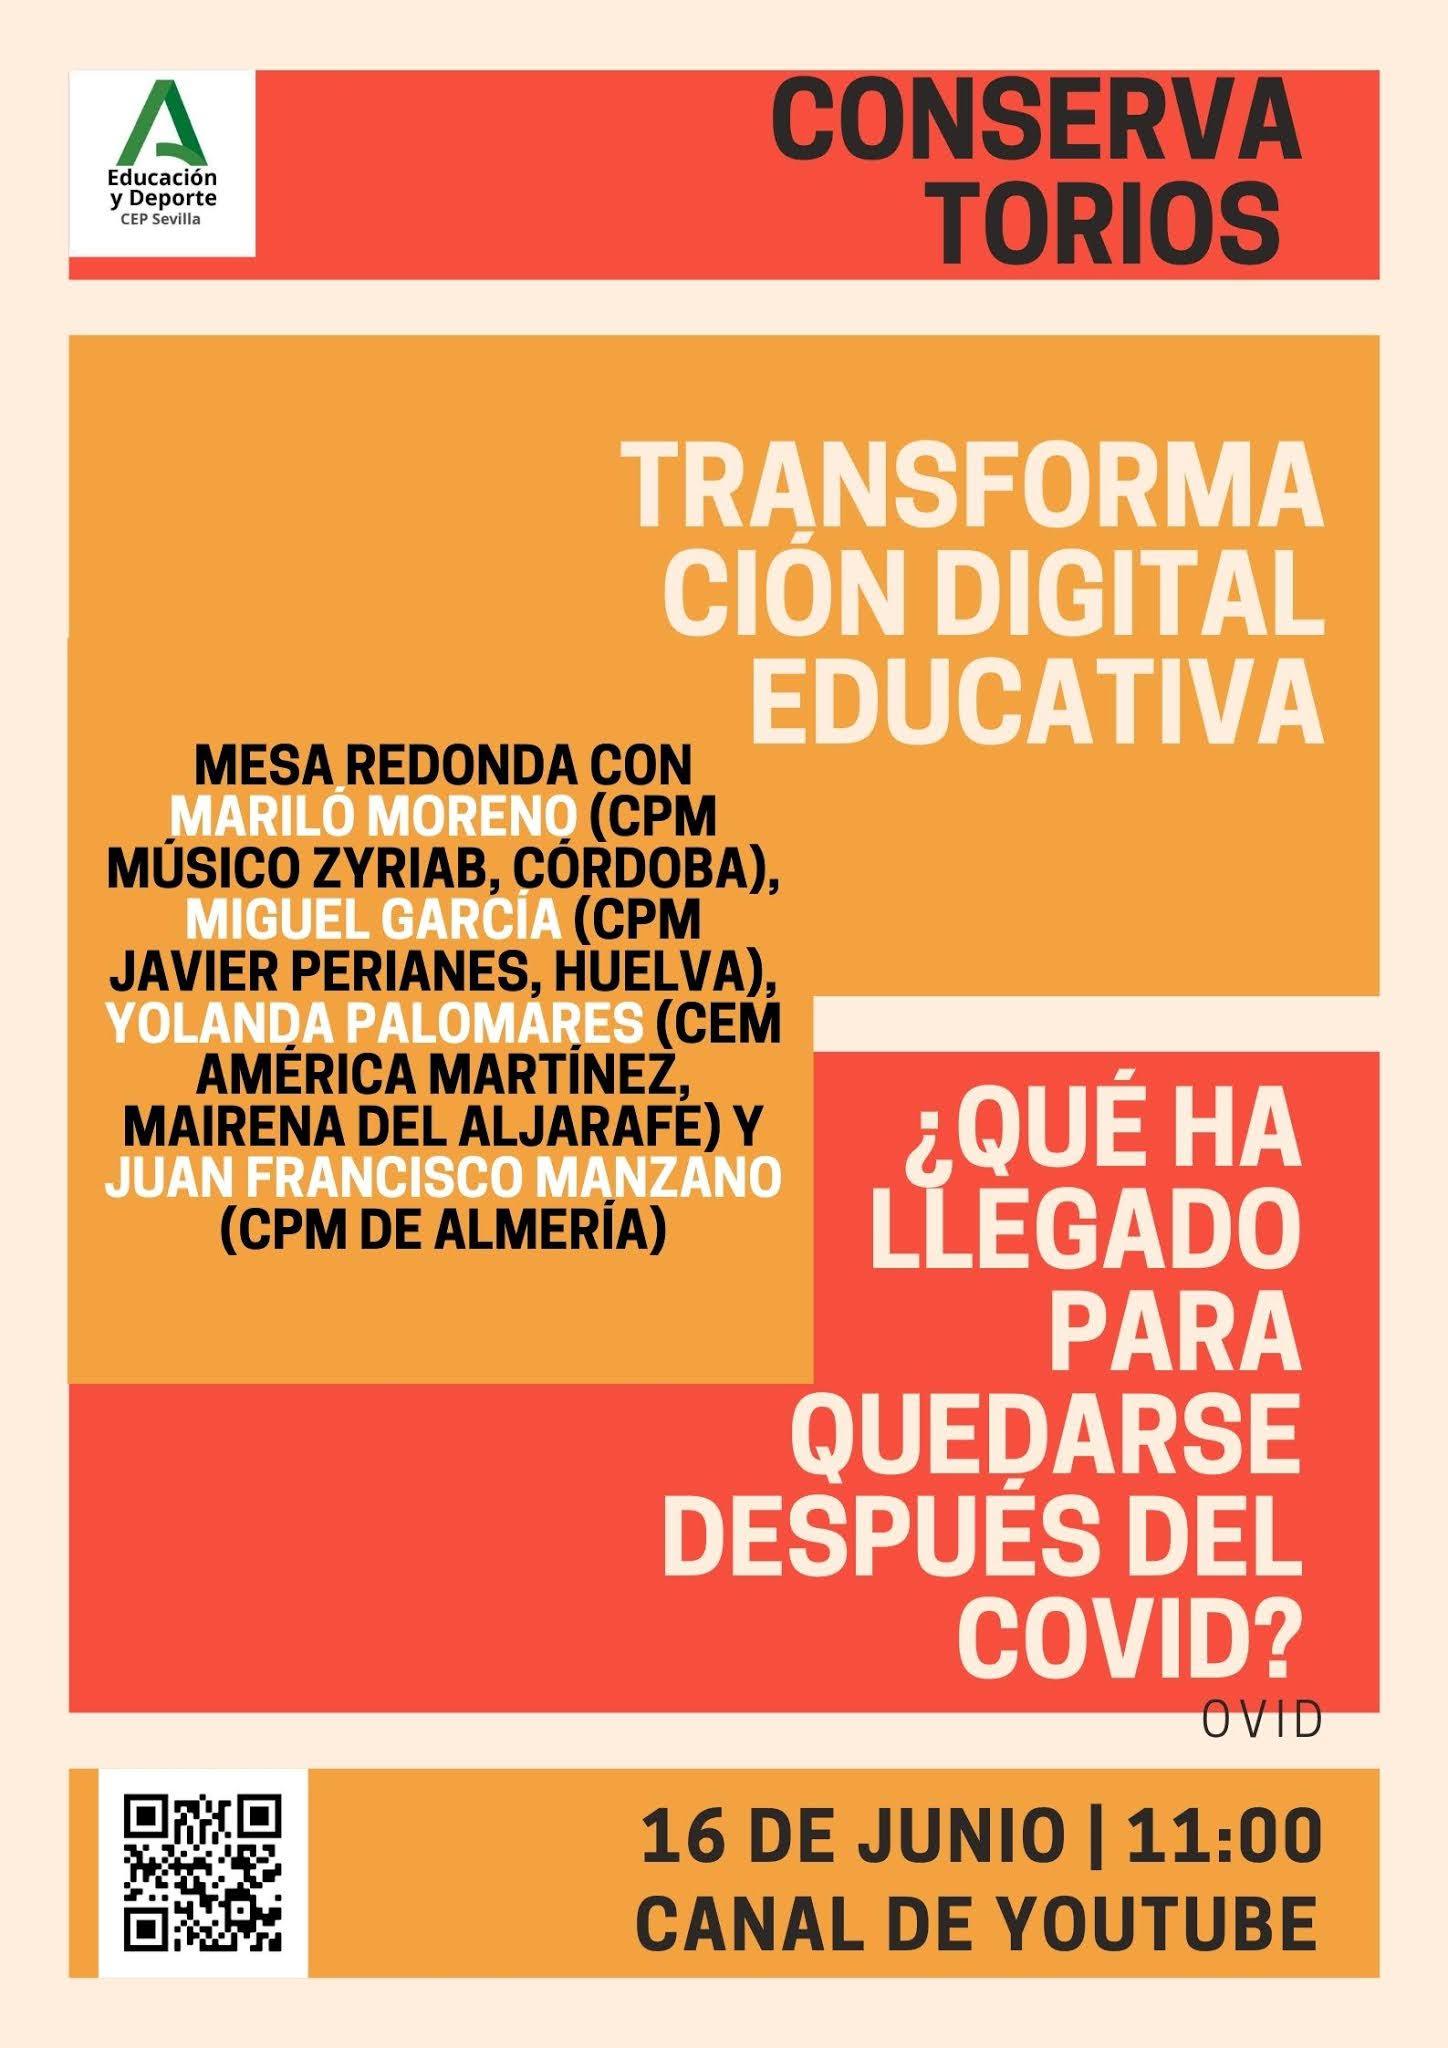 TDE y Conservatorio (TDE_Conservatorios.jpg)